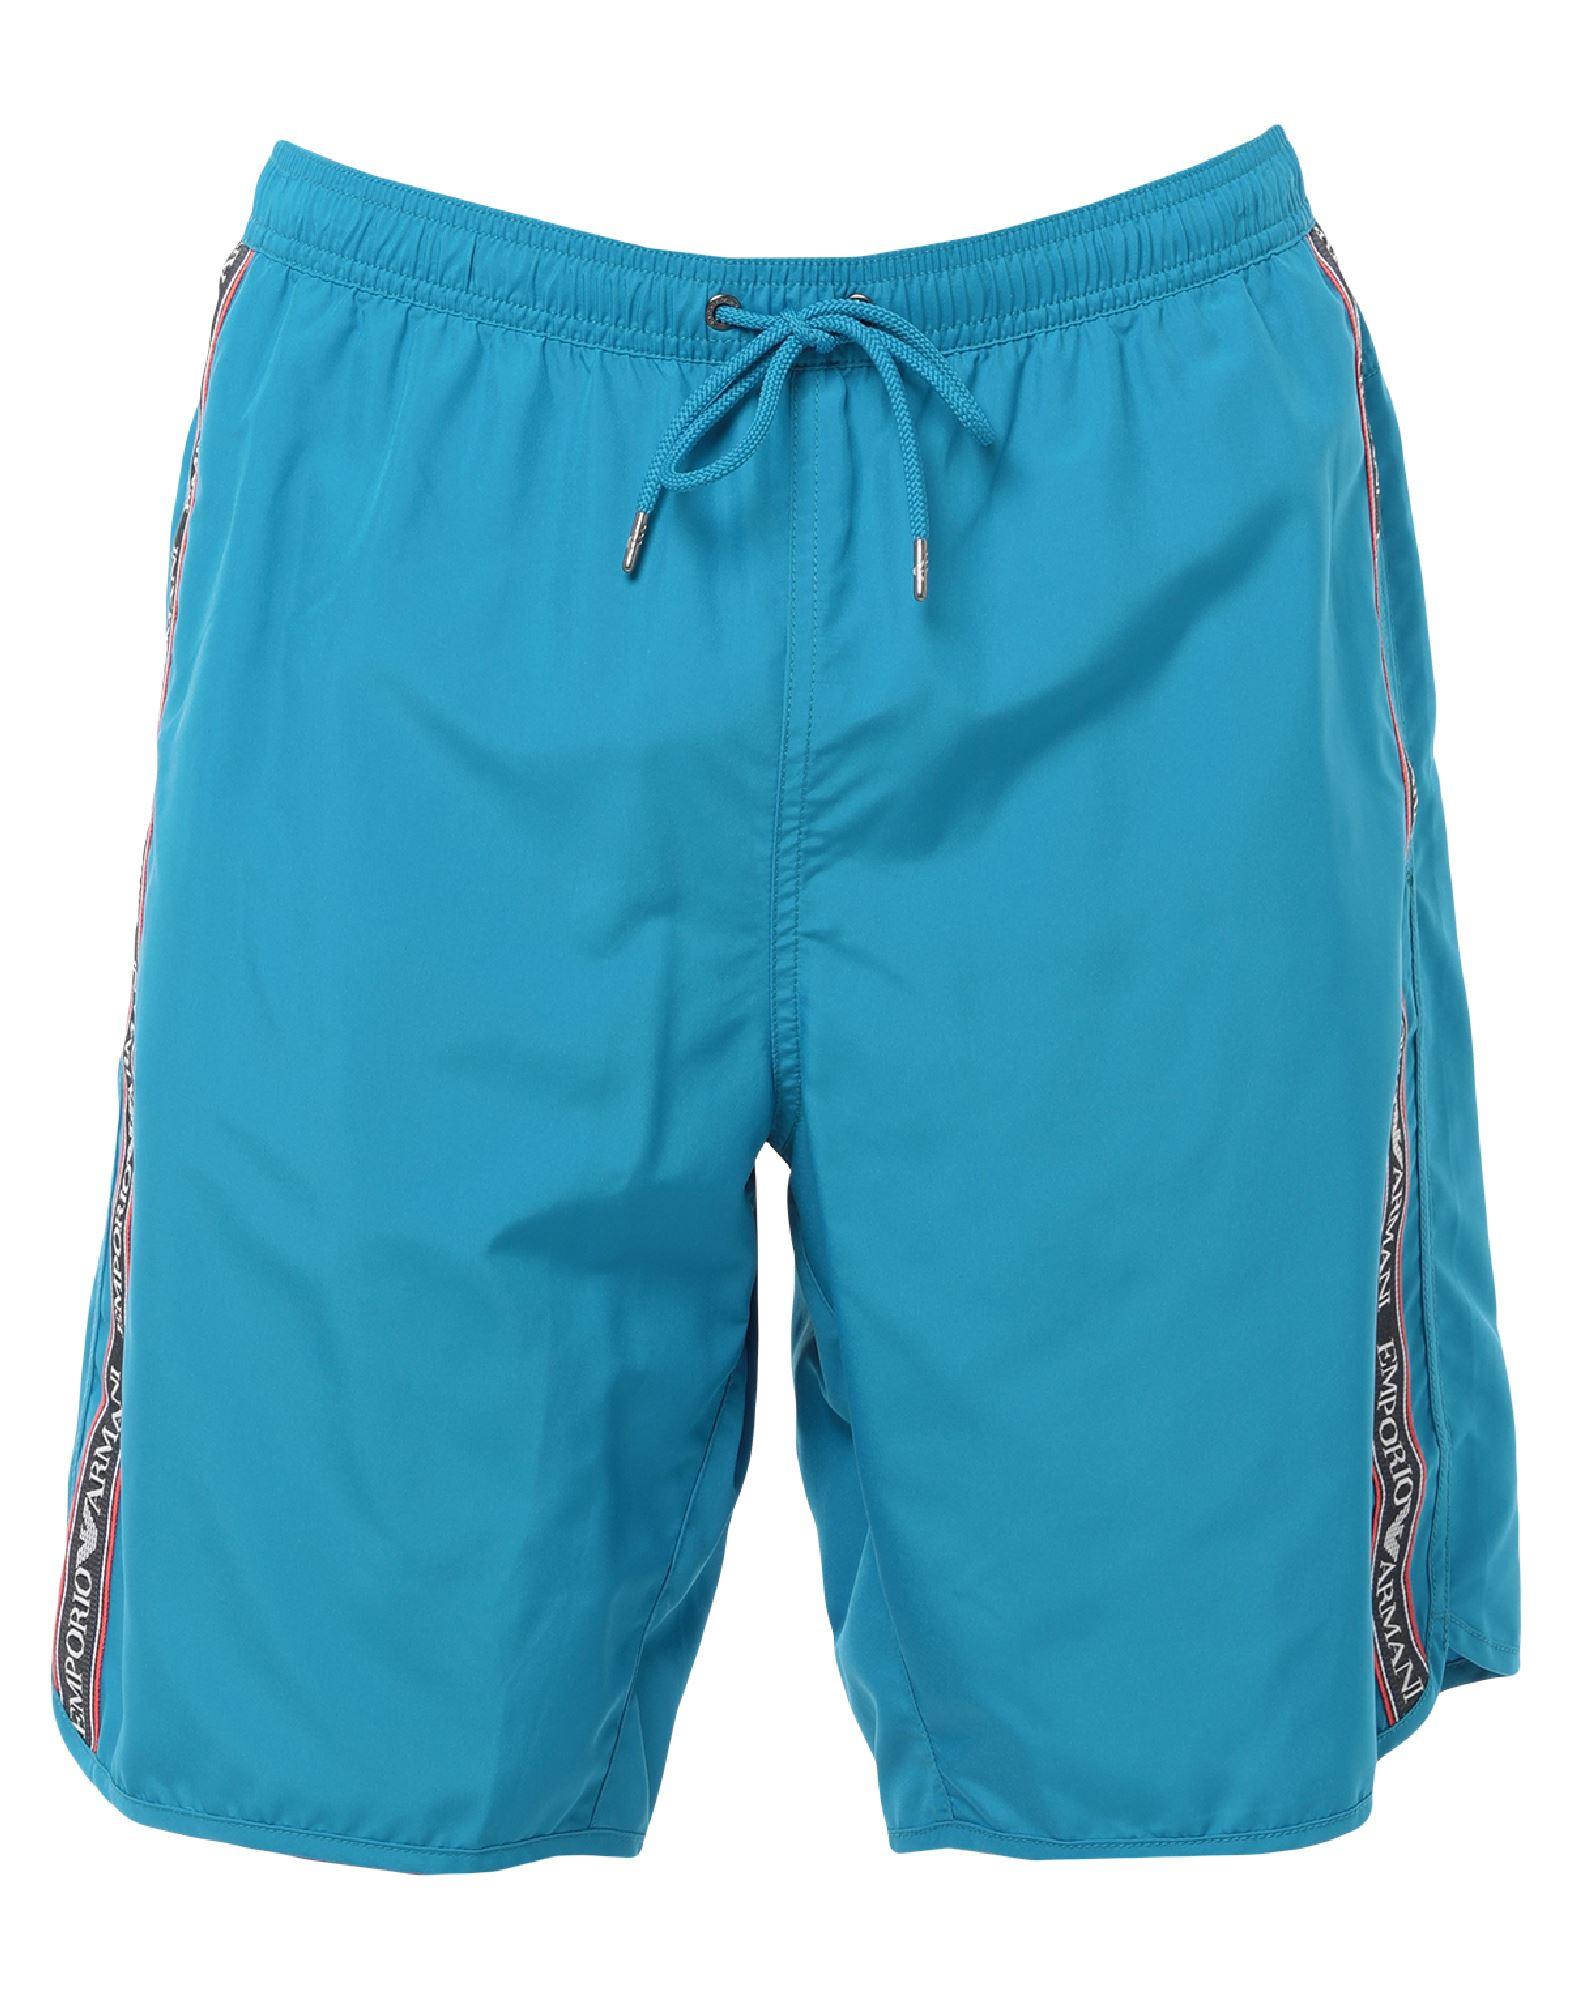 EMPORIO ARMANI Swim trunks - Item 47279326